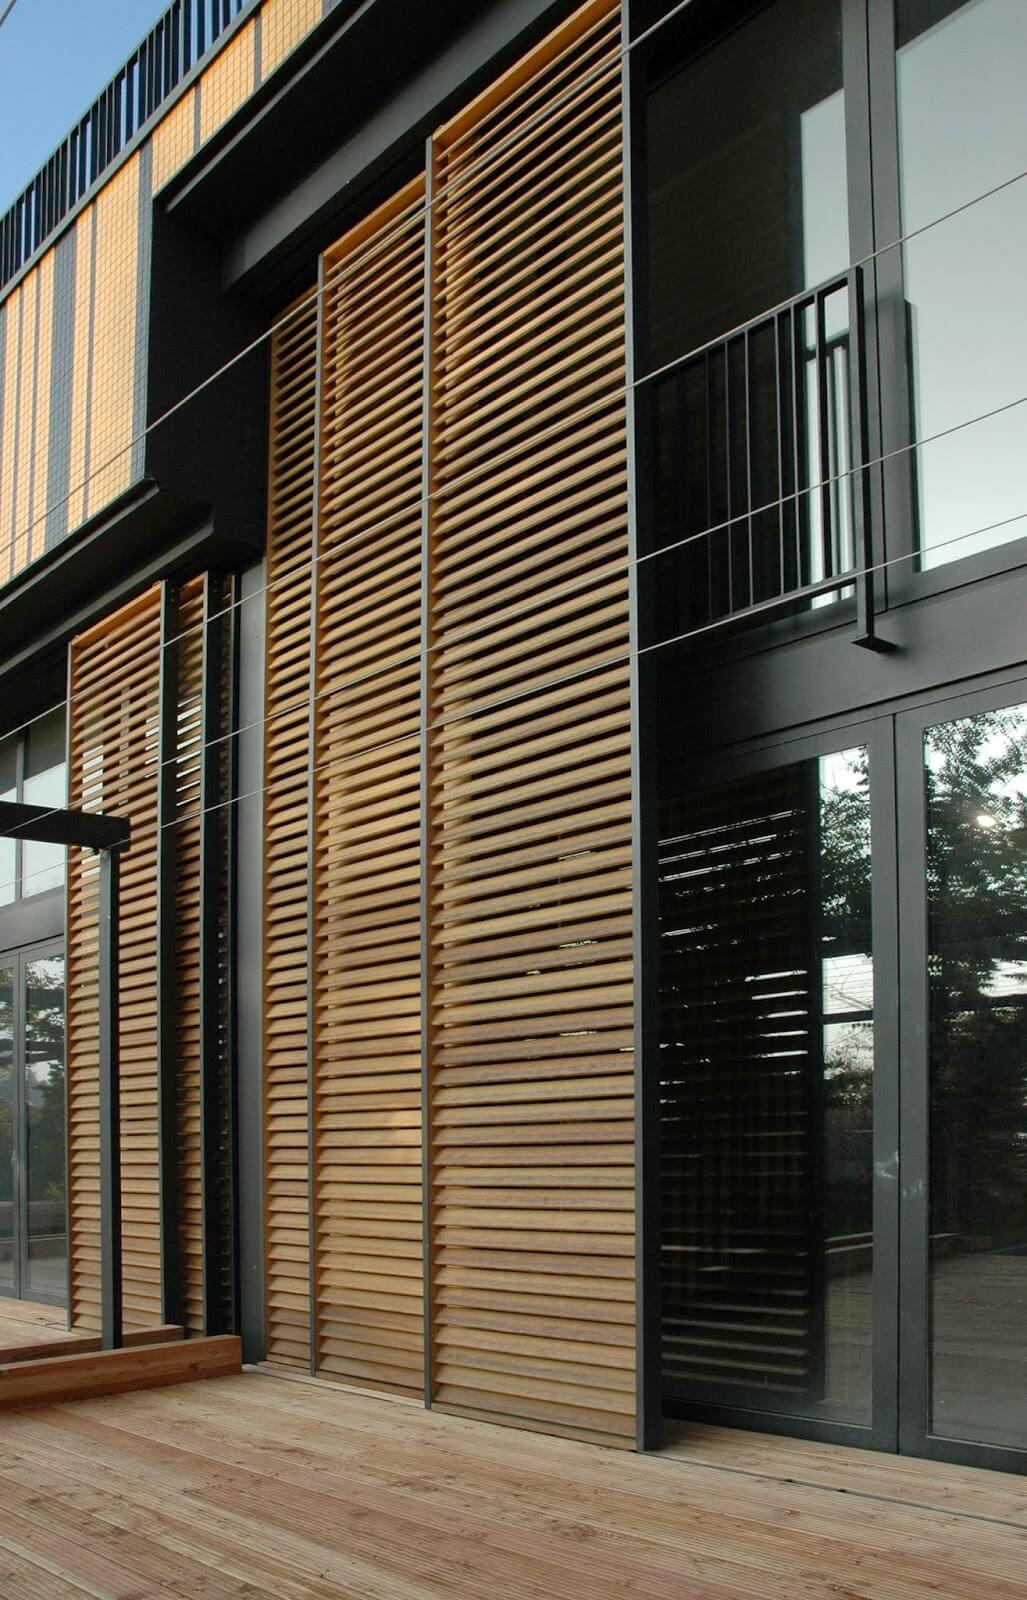 Maison moderne avec bardage bois